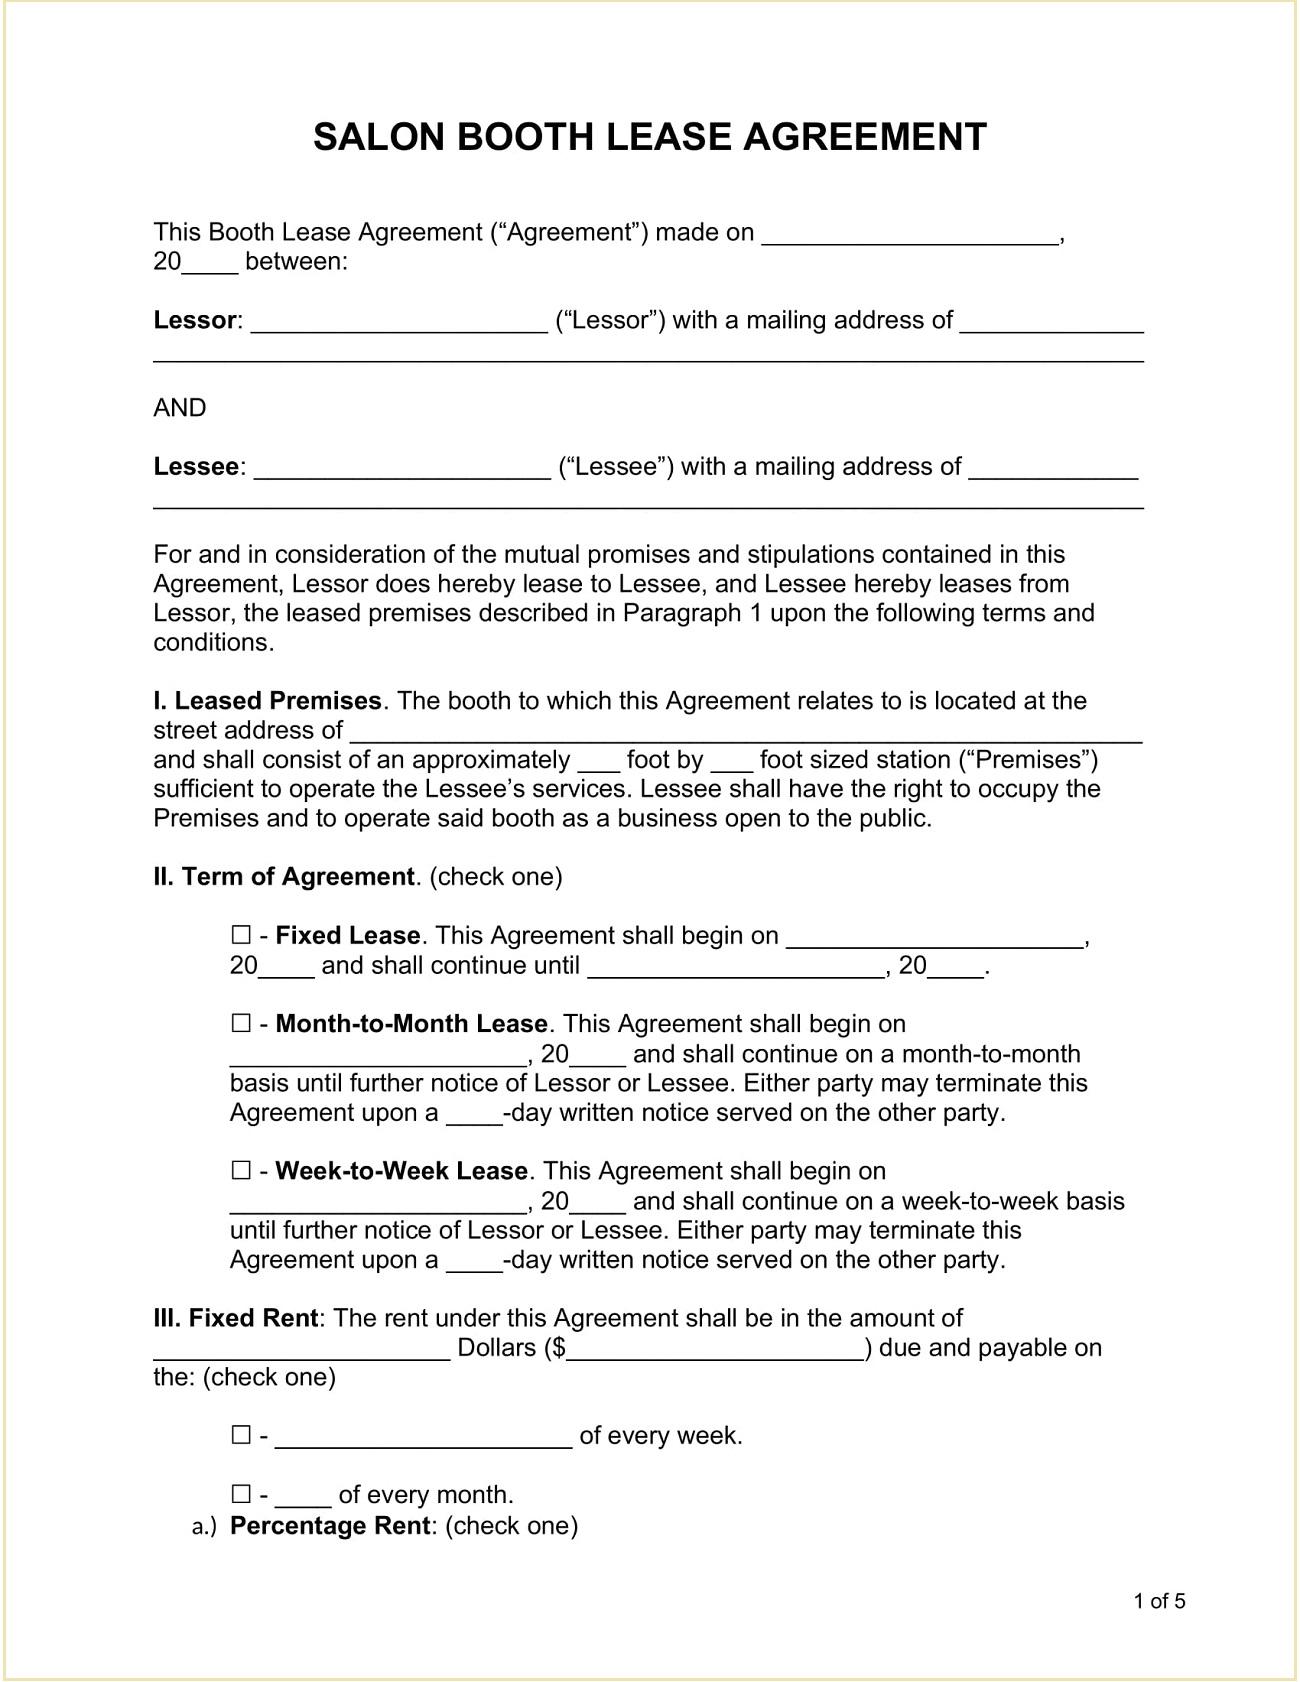 Salon Booth Rental Agreement Template Word